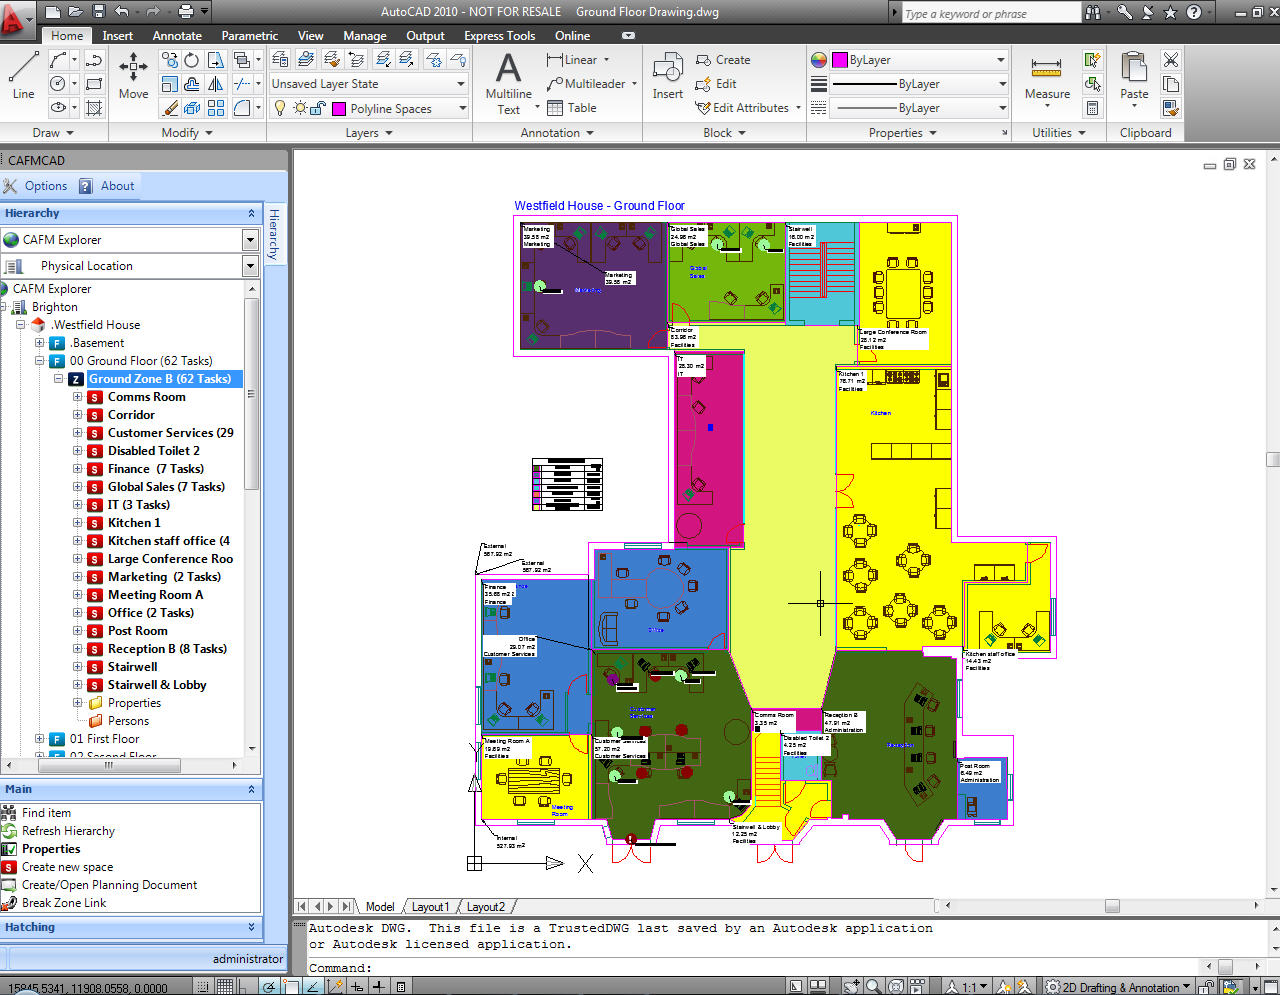 CAFM Explorer - Floor plan